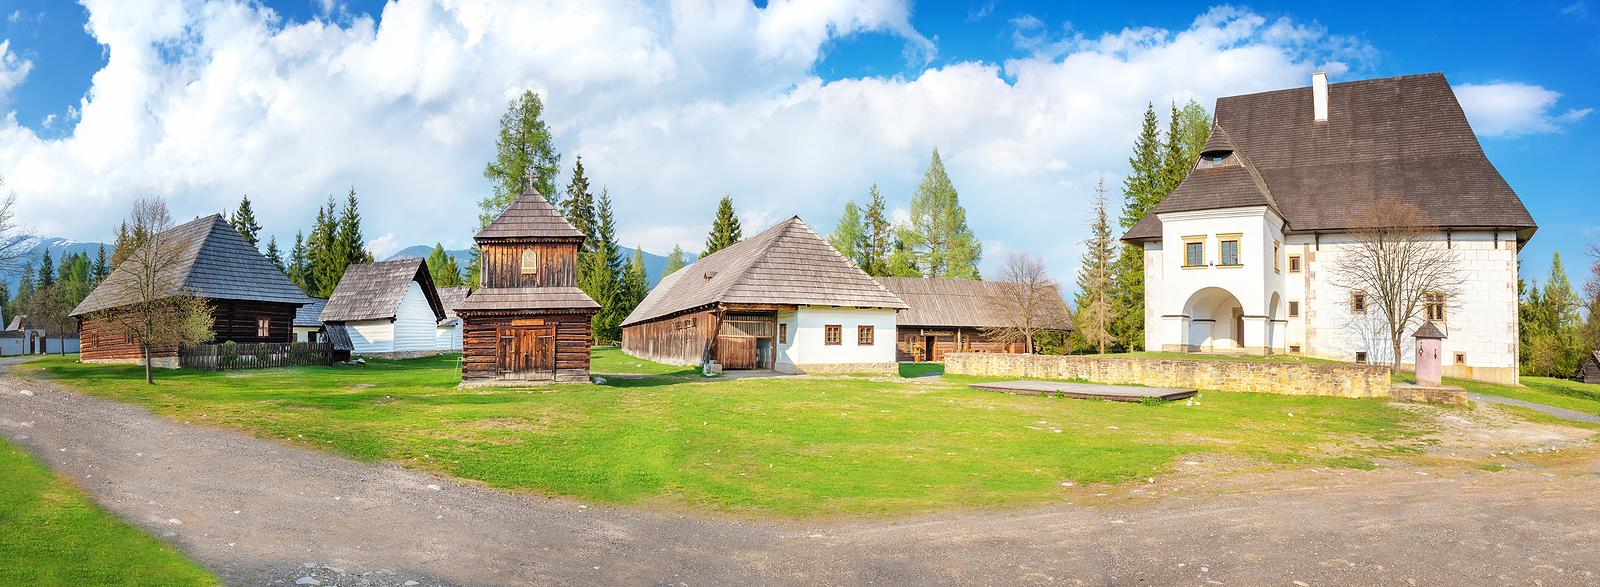 Museum of Liptov village in Pribylina